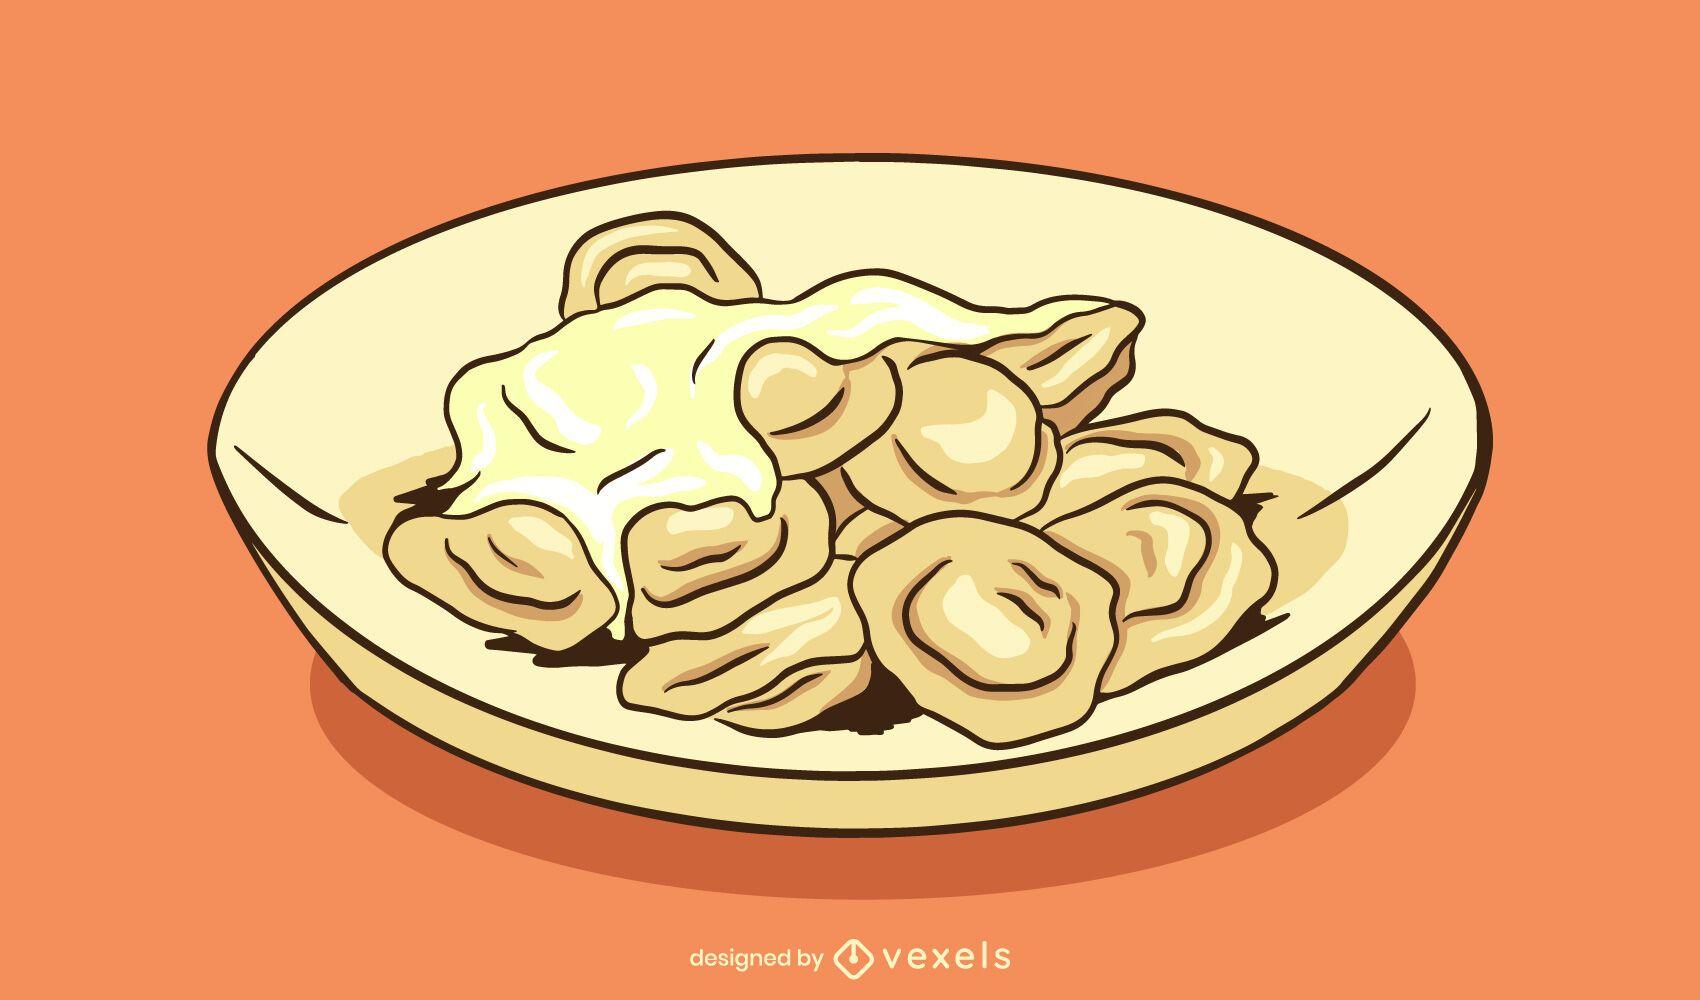 Pelmeni dish illustration design